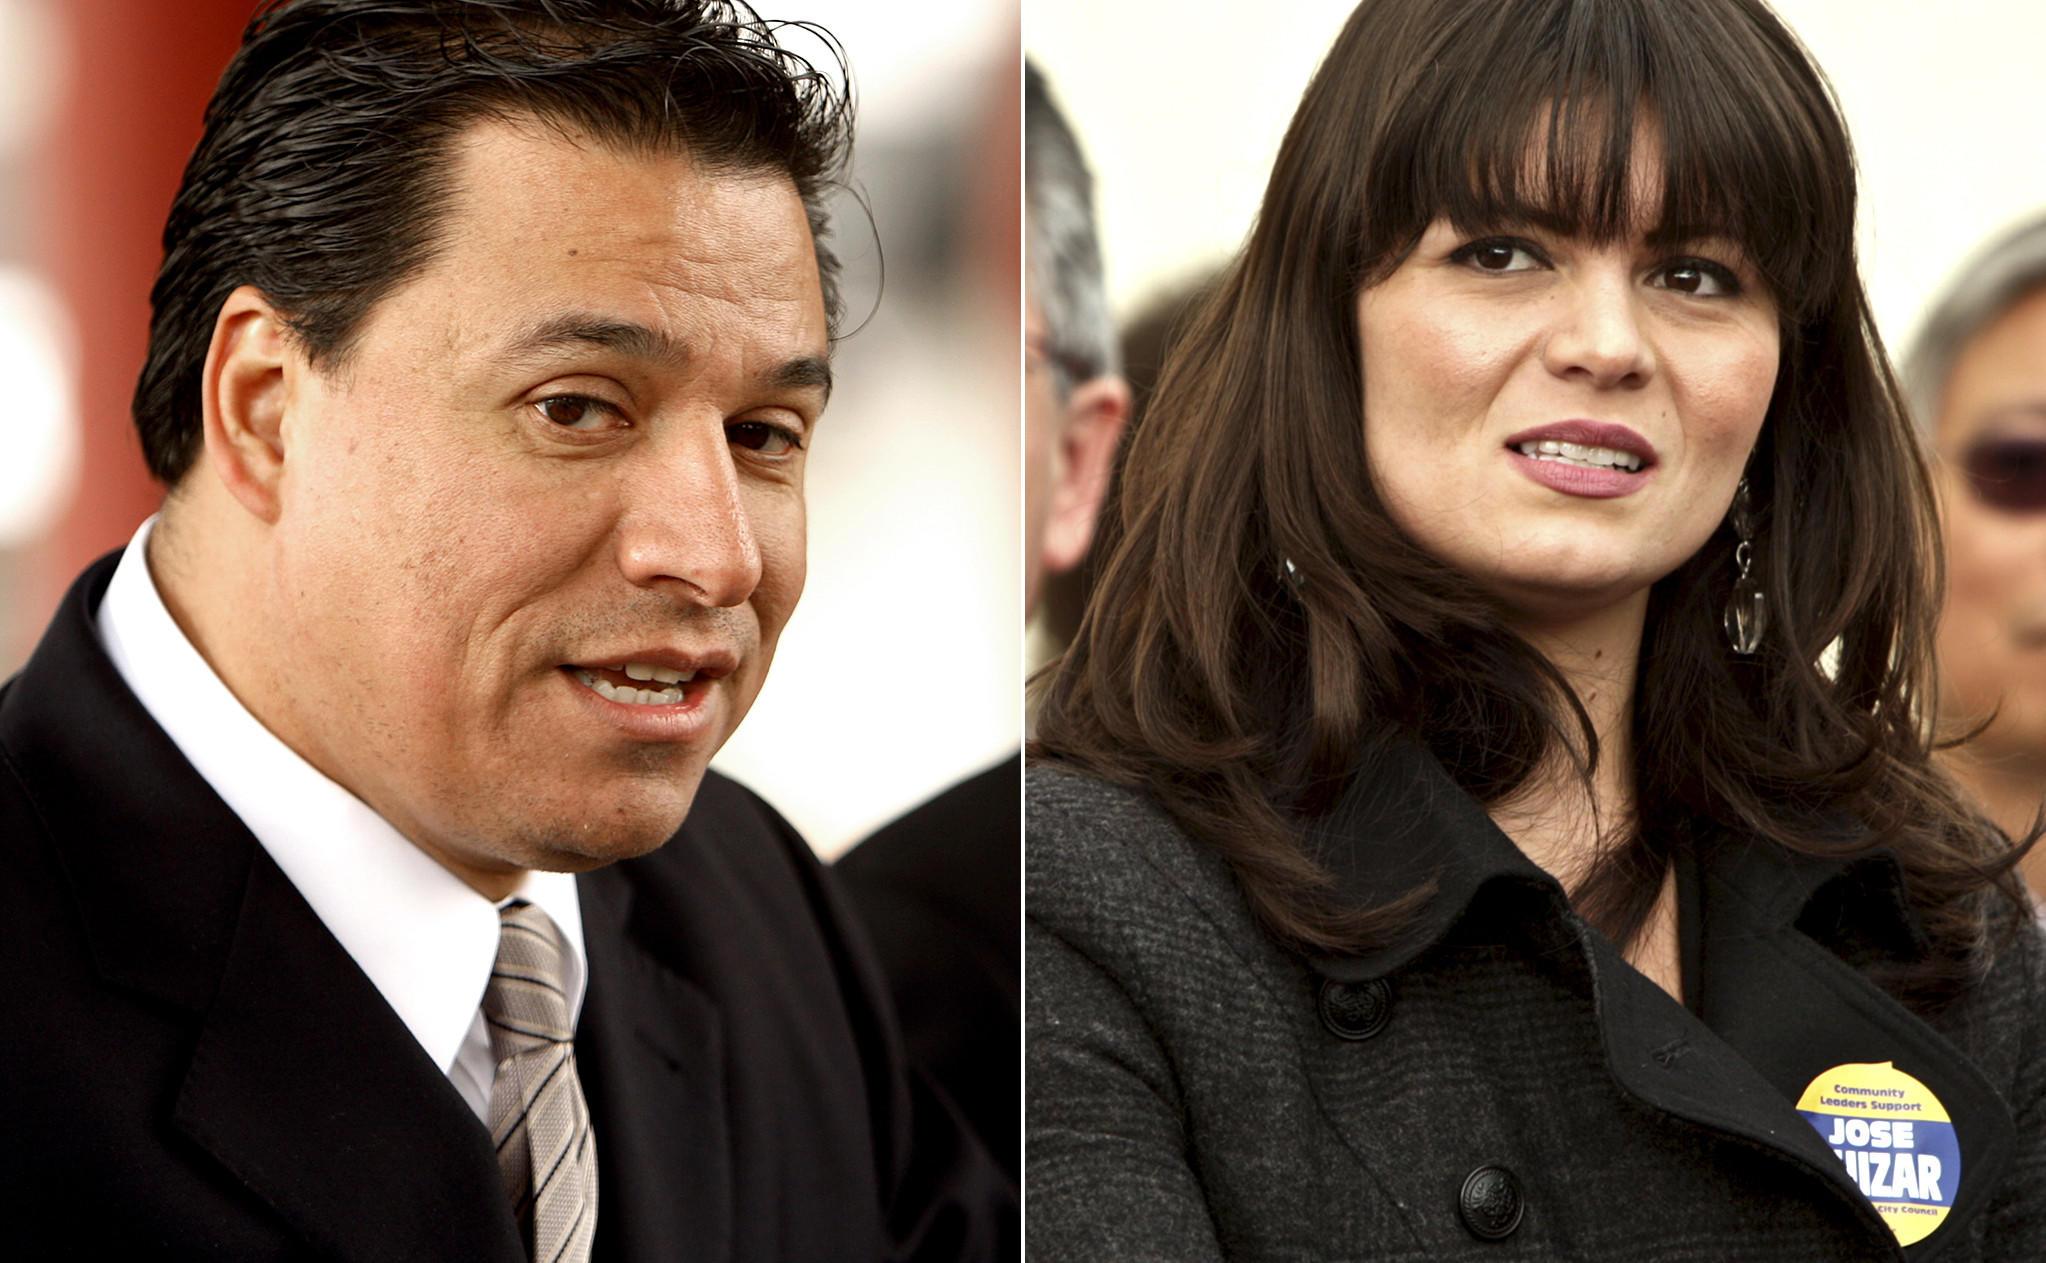 Los Angeles City Councilman Jose Huizar and Francine Godoy, his former deputy chief of staff.